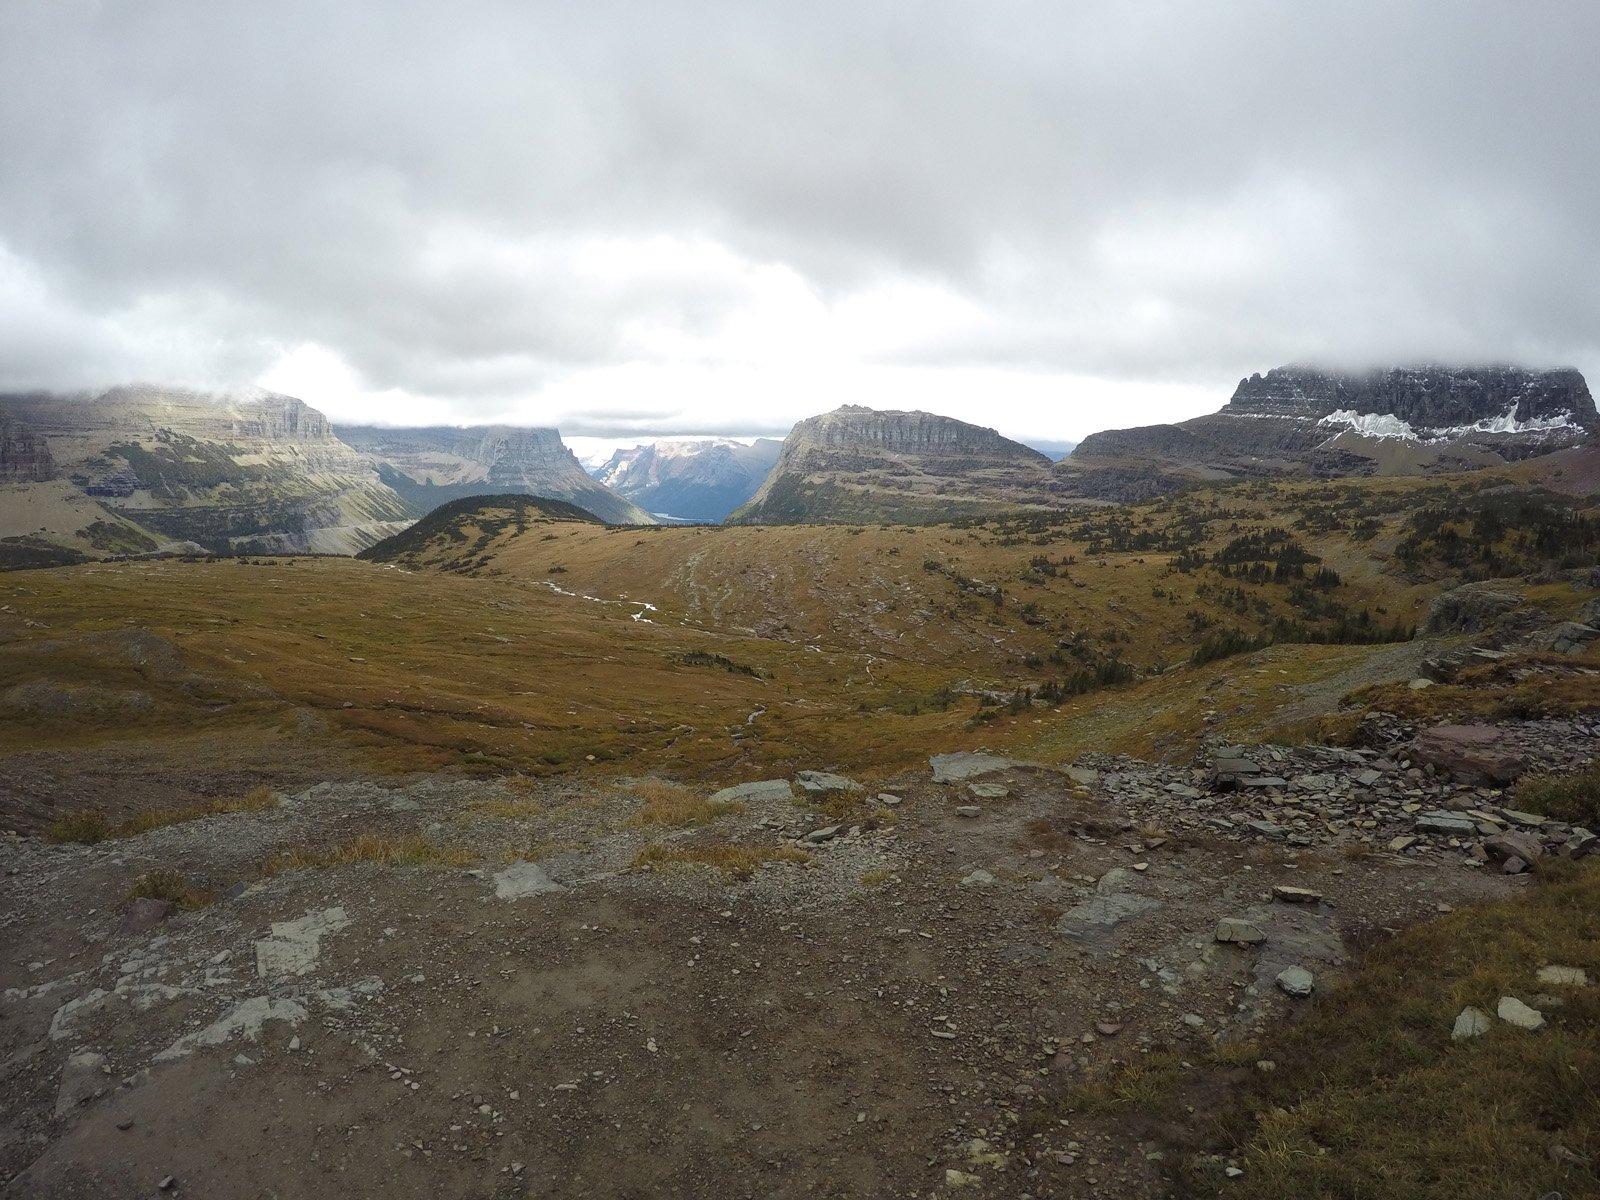 glacier national park is wild